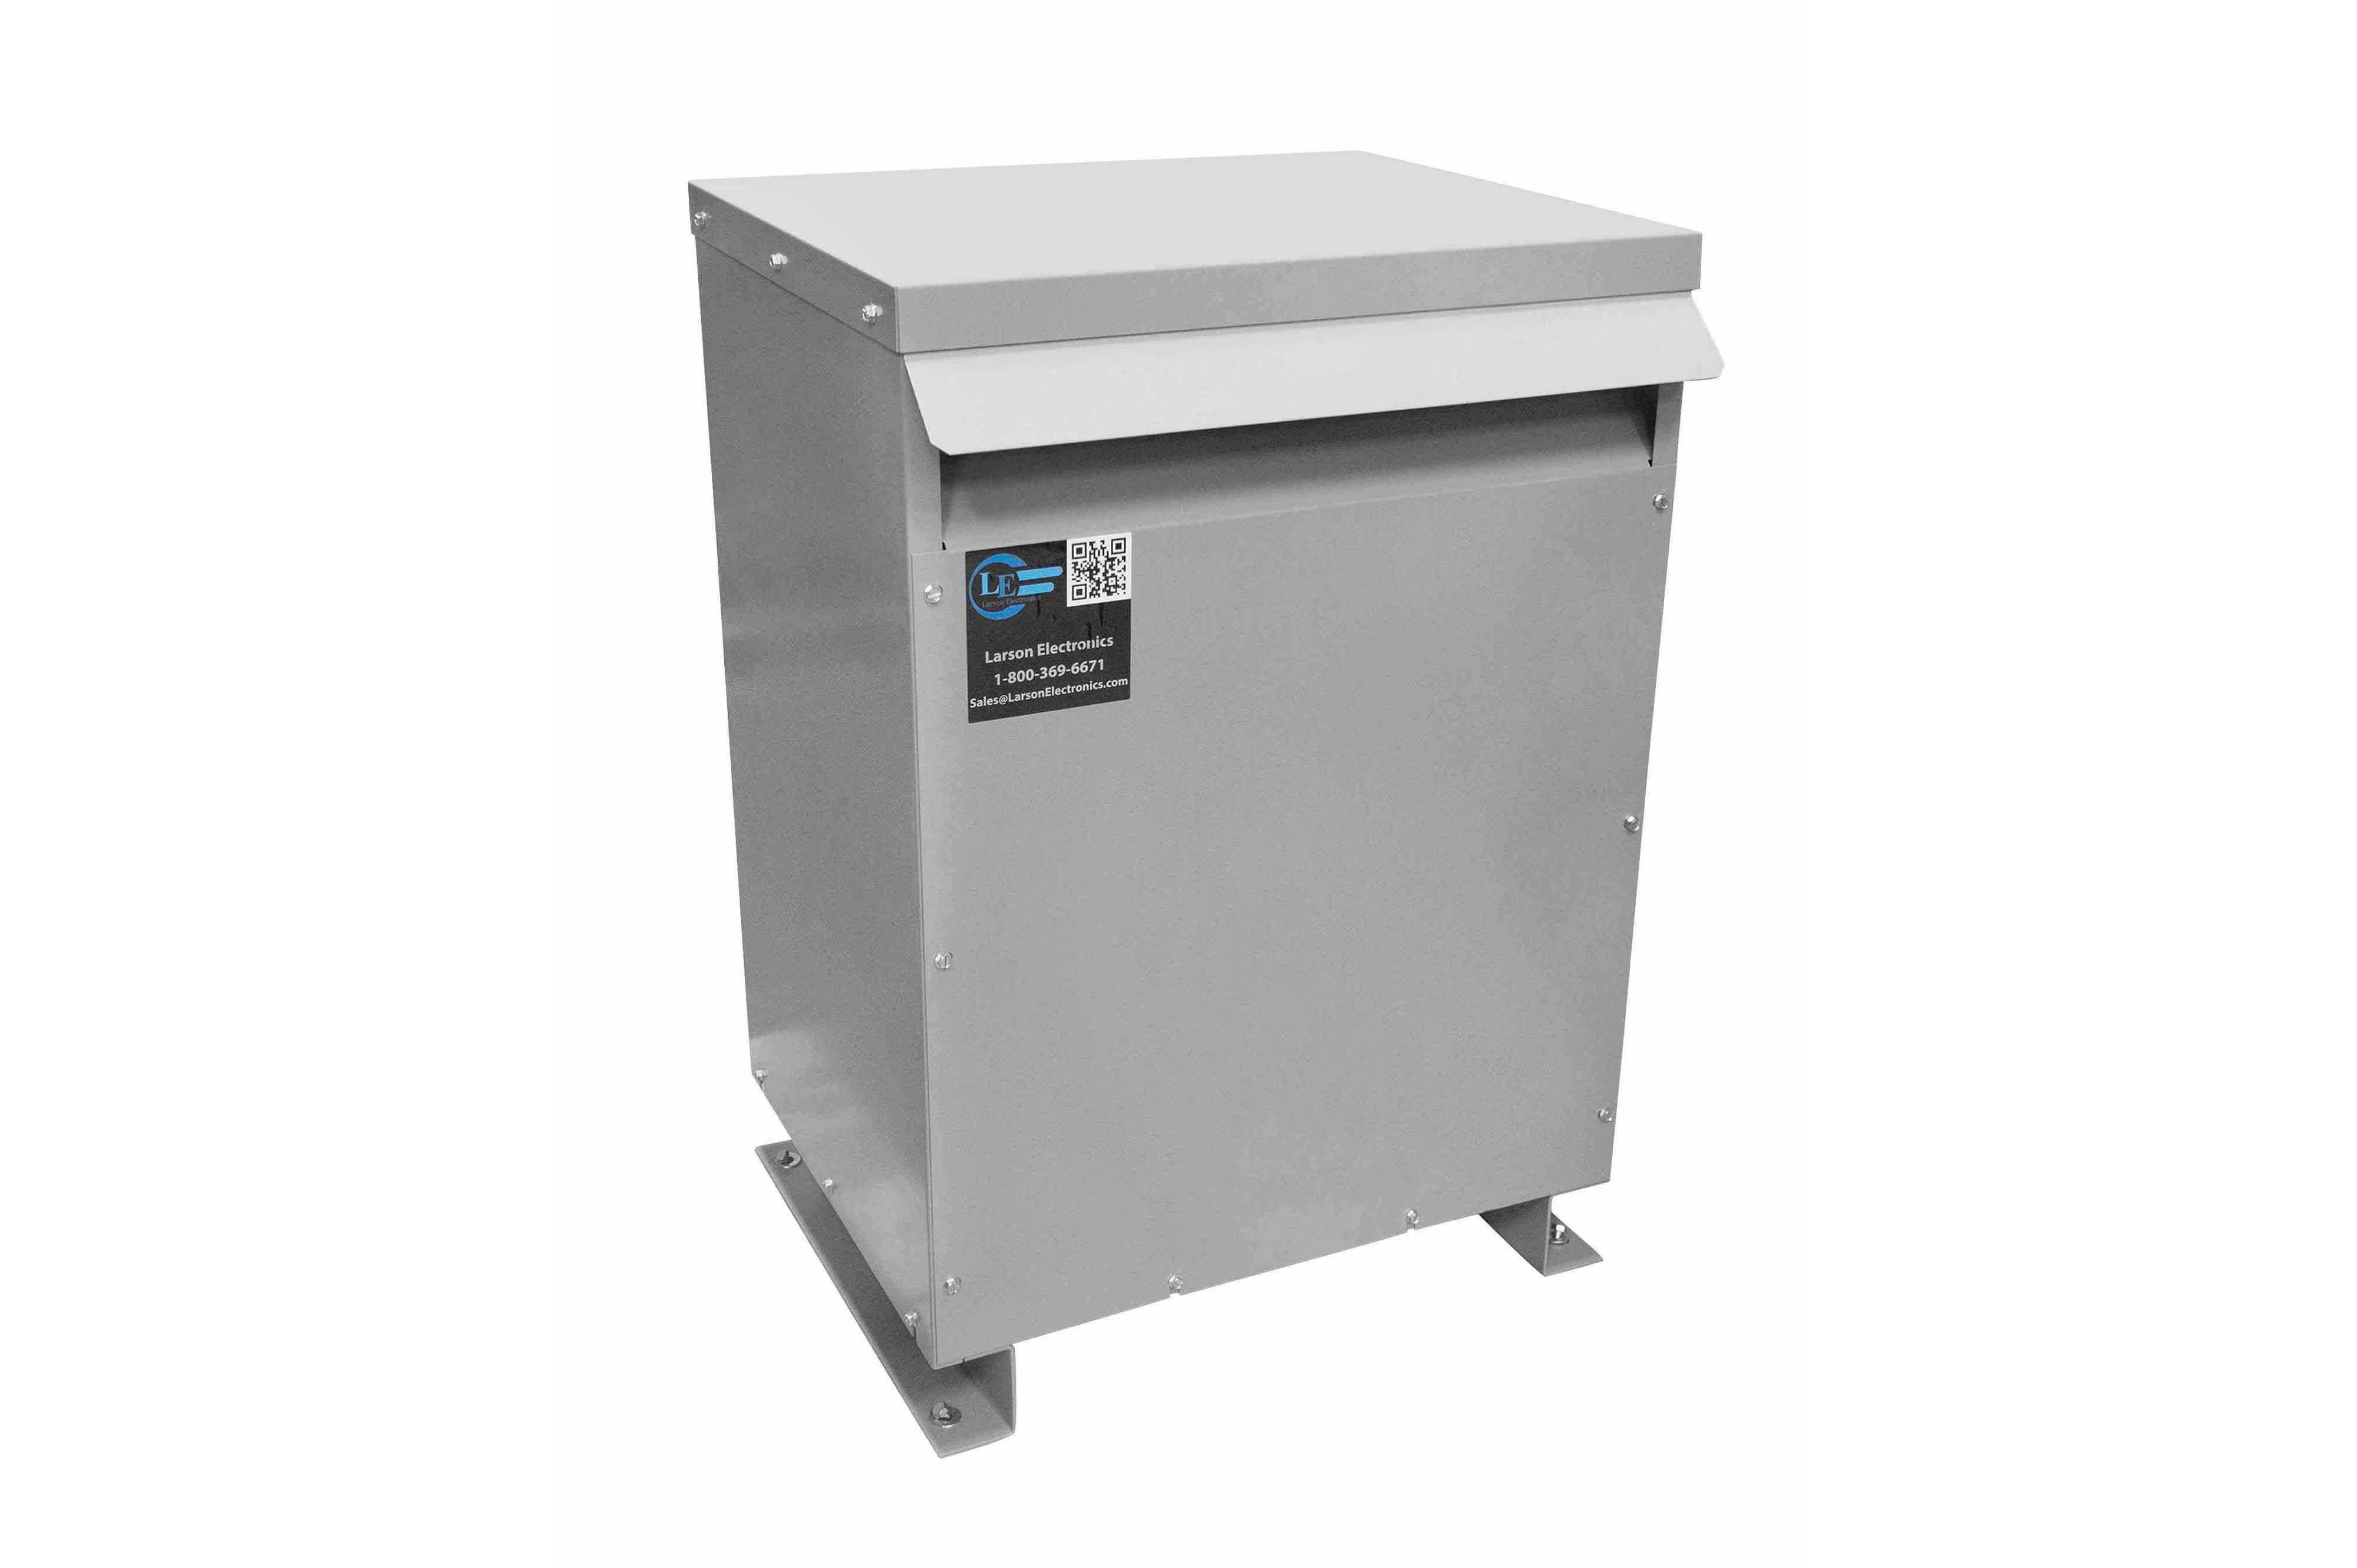 26 kVA 3PH Isolation Transformer, 208V Wye Primary, 480Y/277 Wye-N Secondary, N3R, Ventilated, 60 Hz